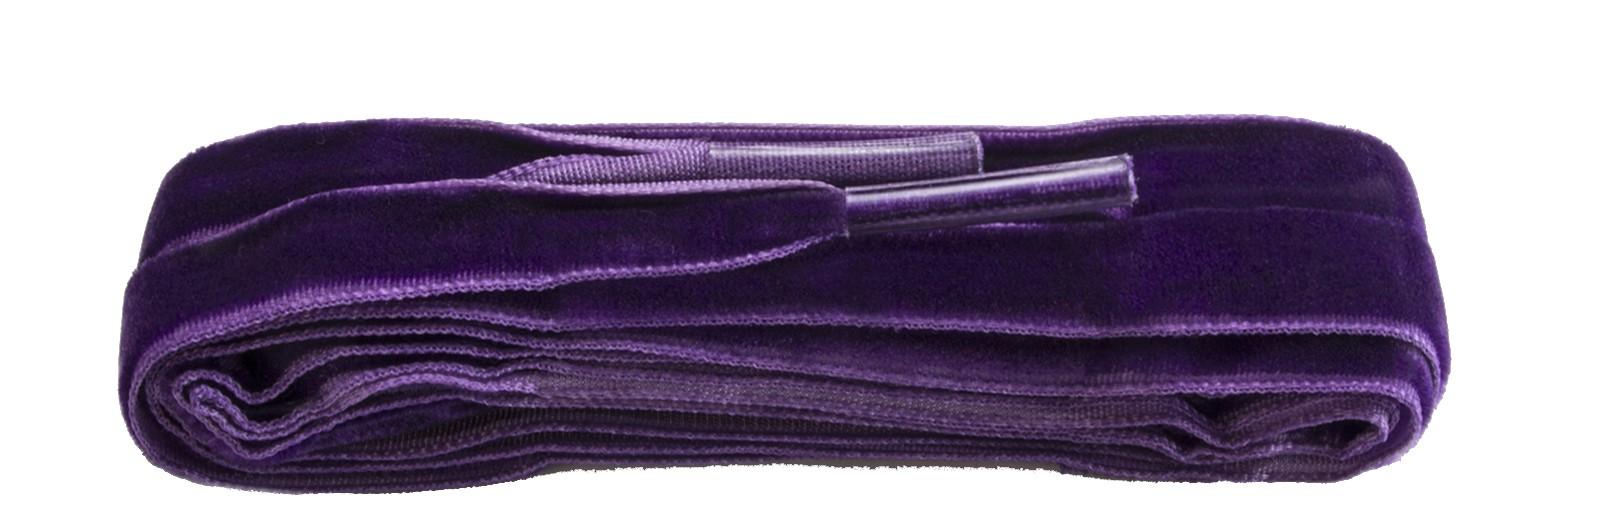 Sneaker Velvet Purple Laces